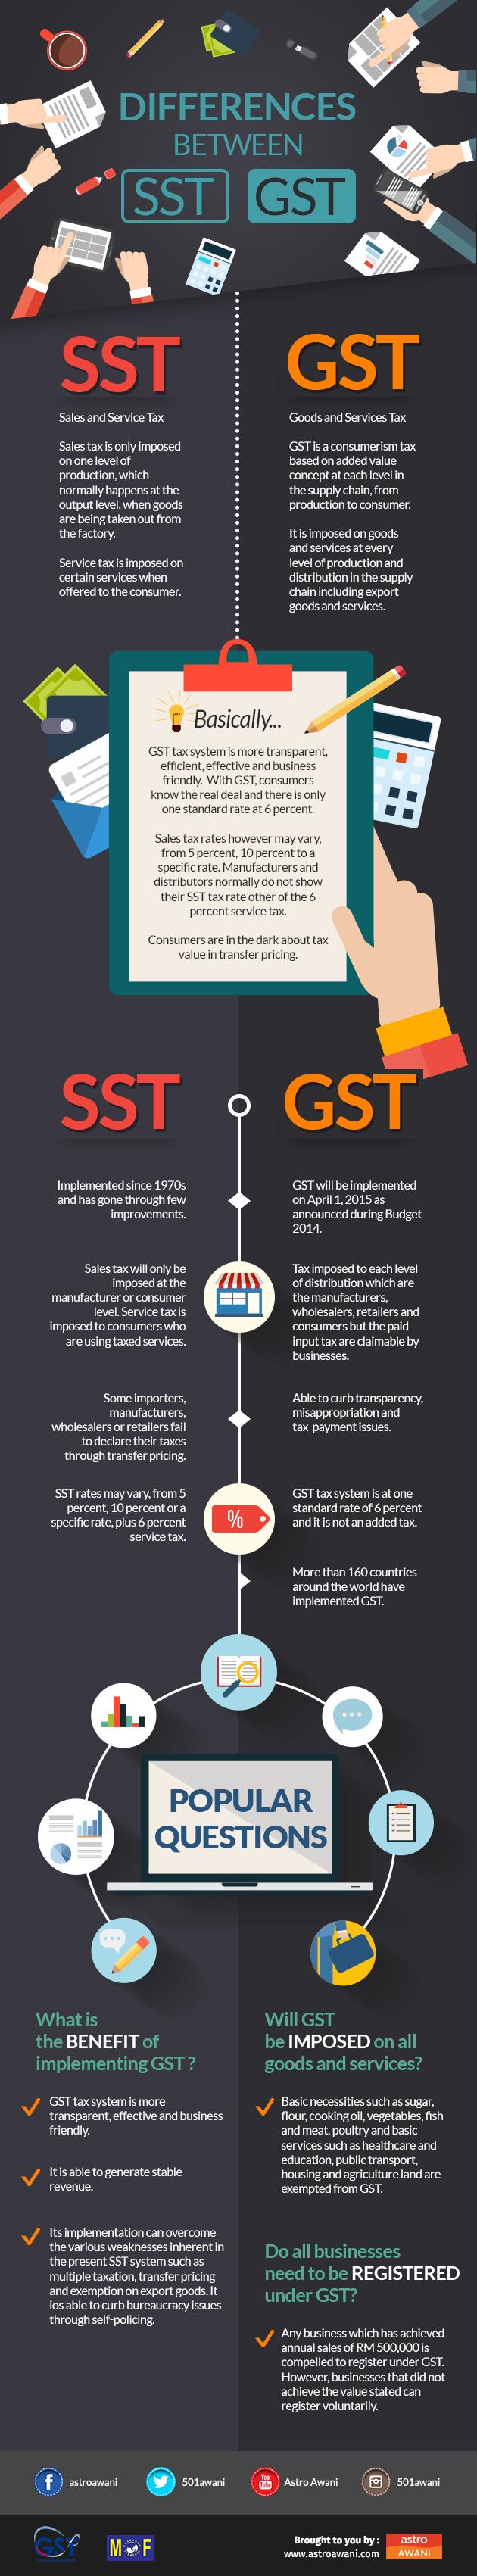 SST vs GST